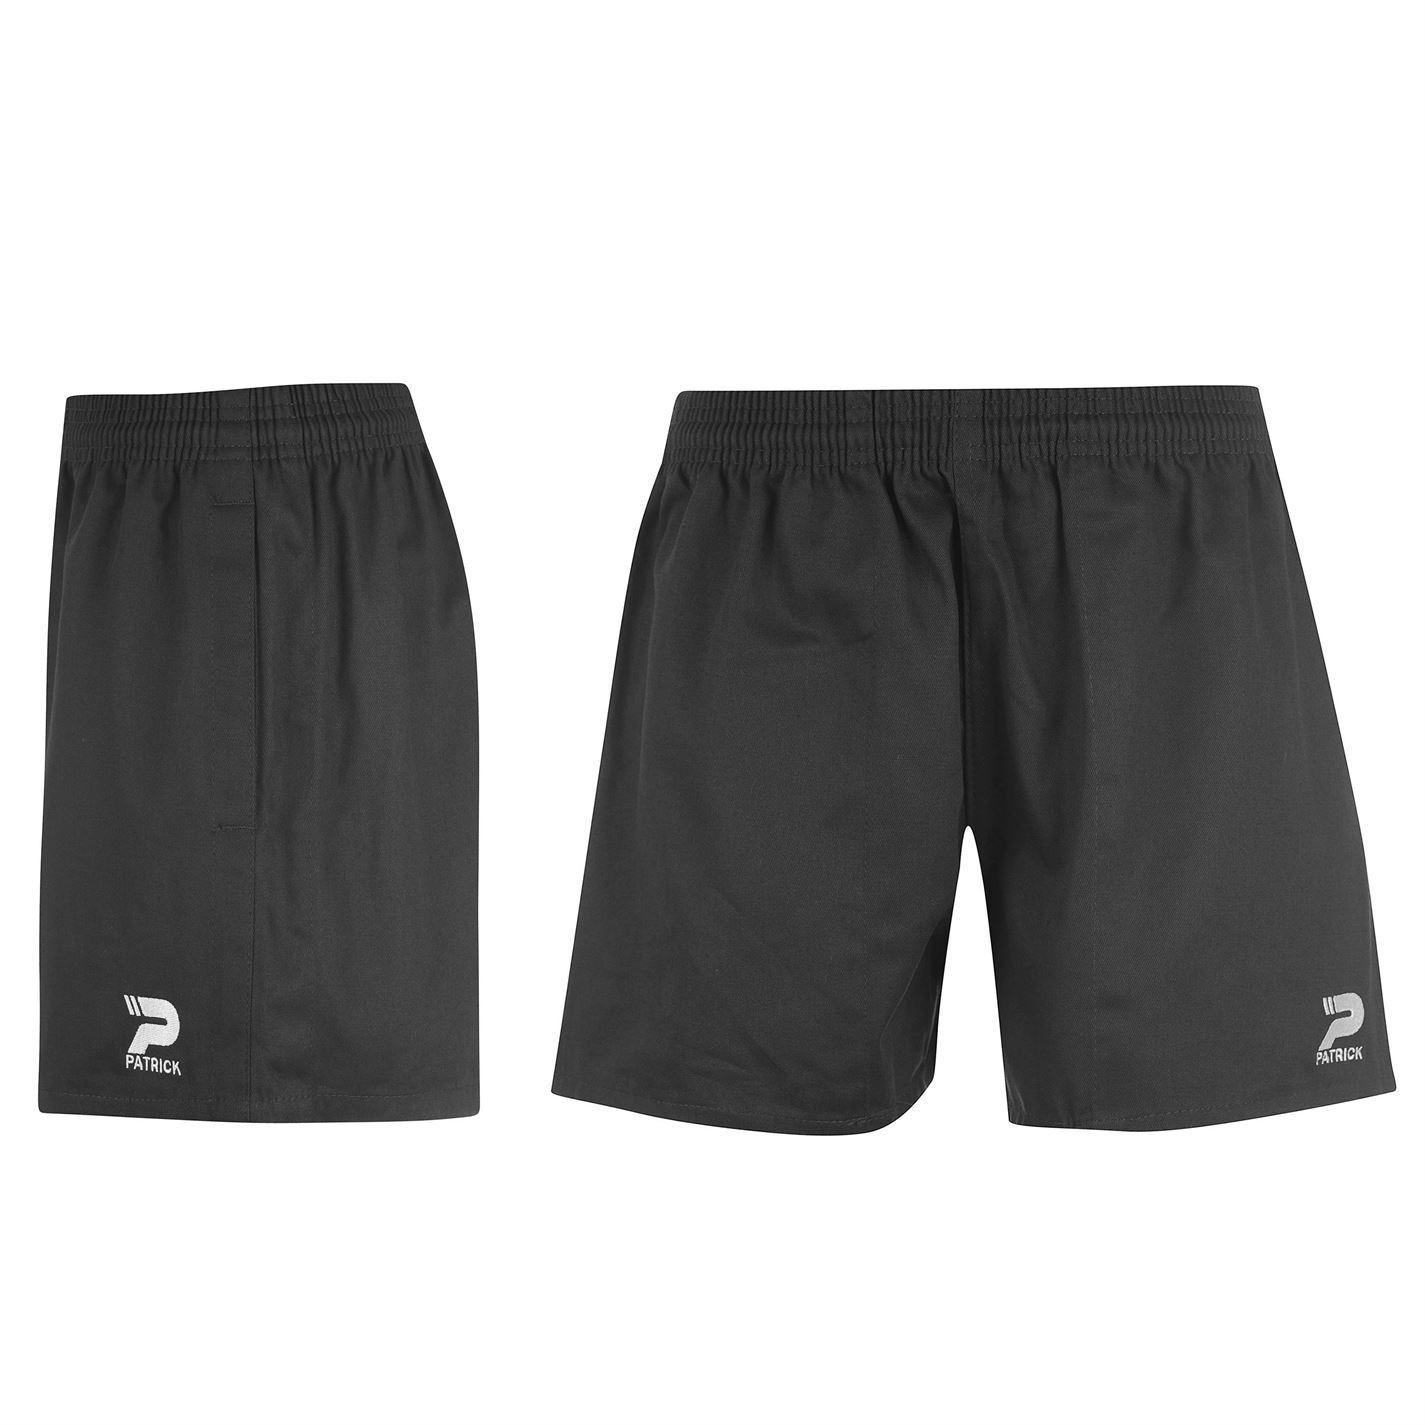 Patrick-Rugby-Shorts-Junior-Boys-Sports-Fan-Bottoms thumbnail 5